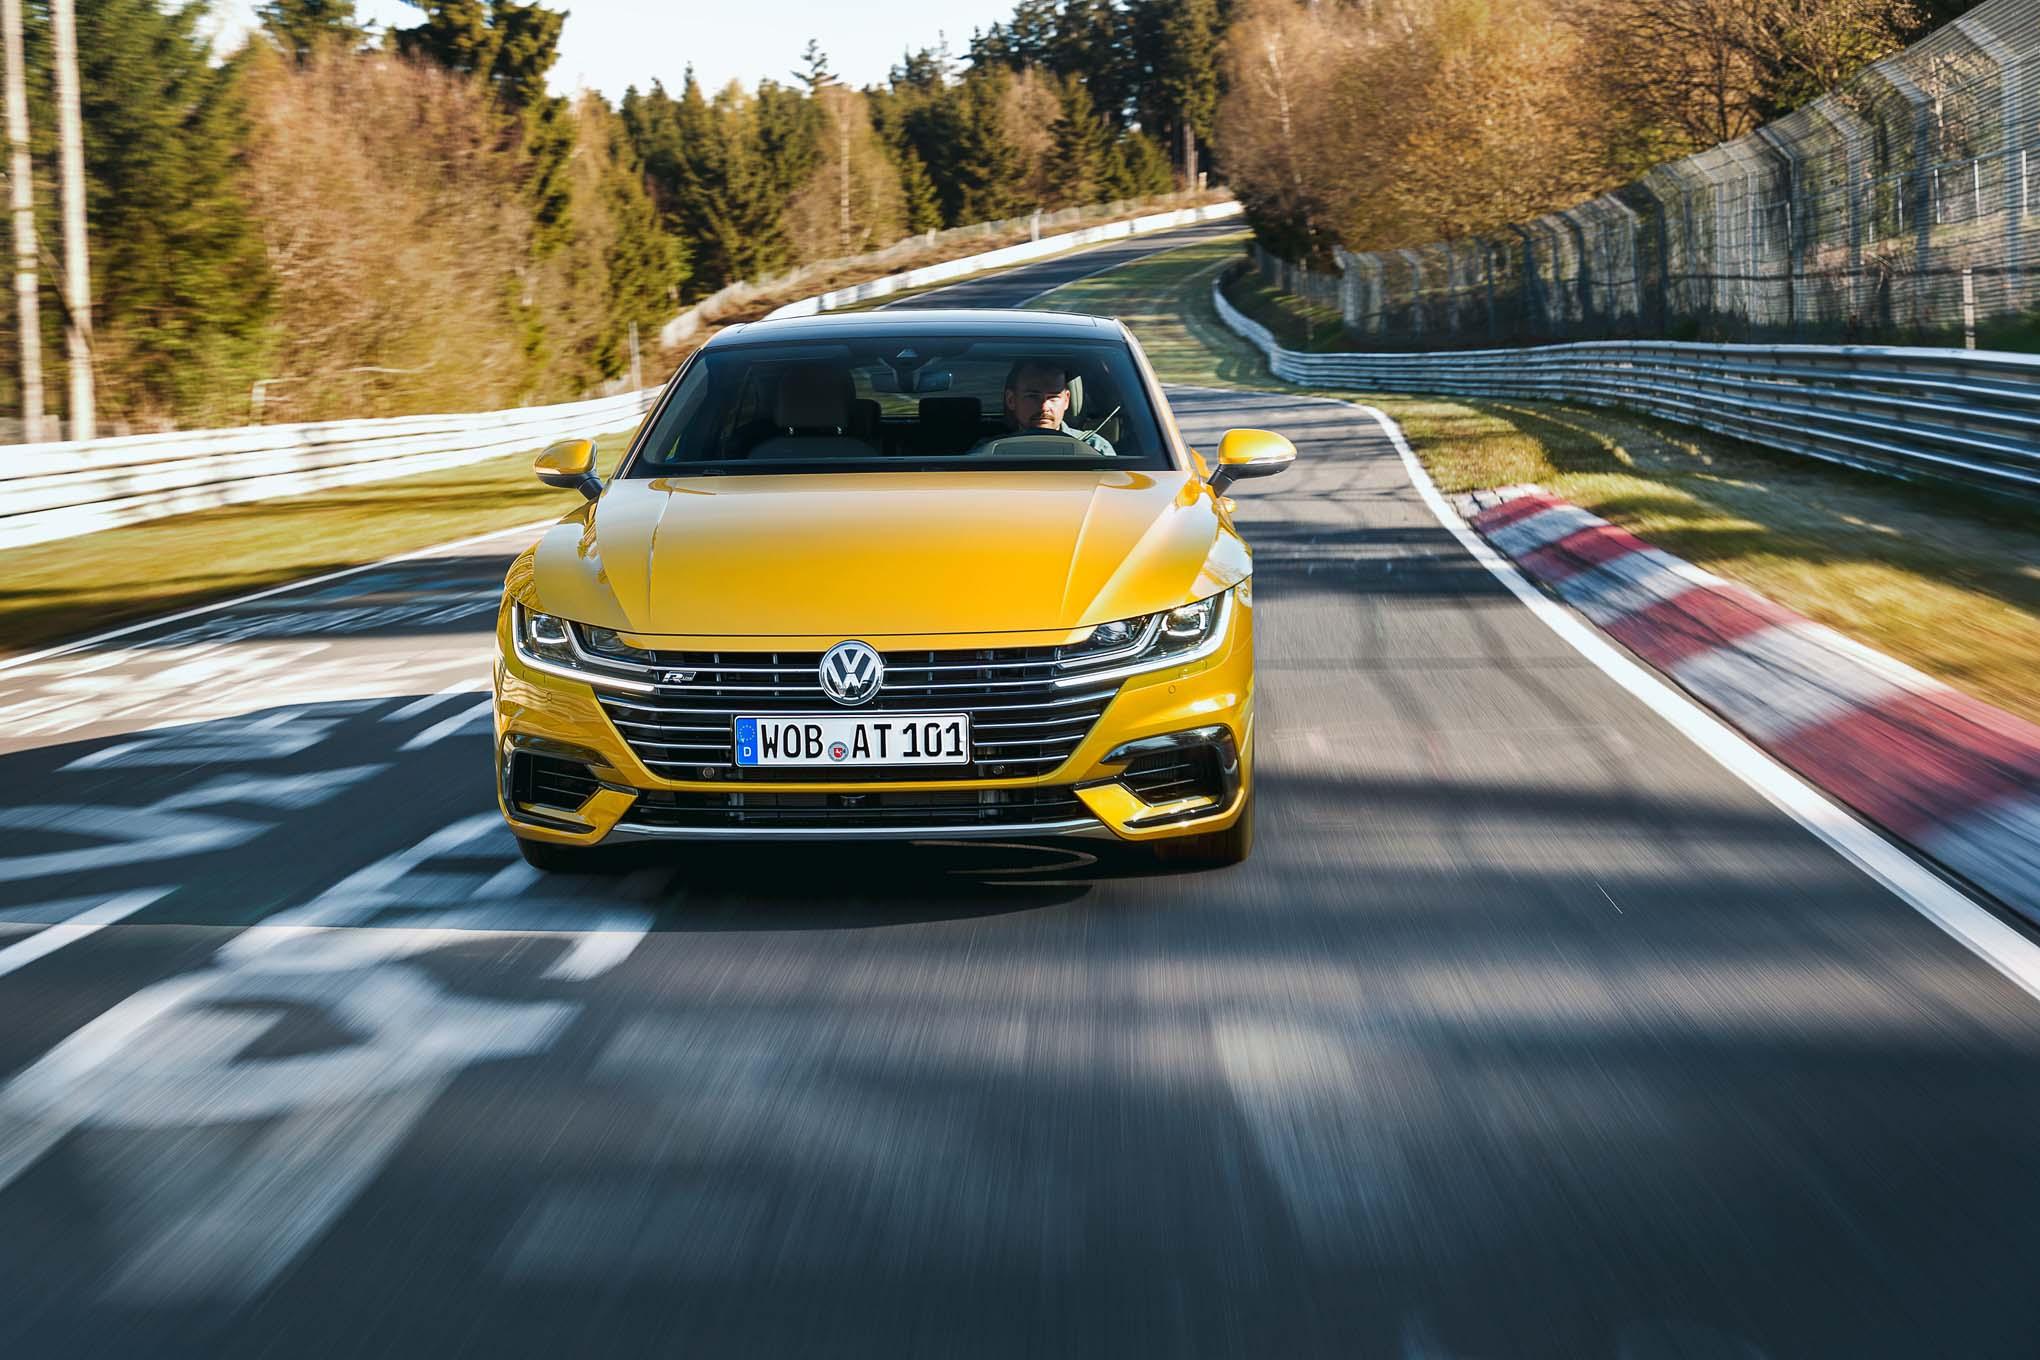 2019 Volkswagen Arteon First Drive Review